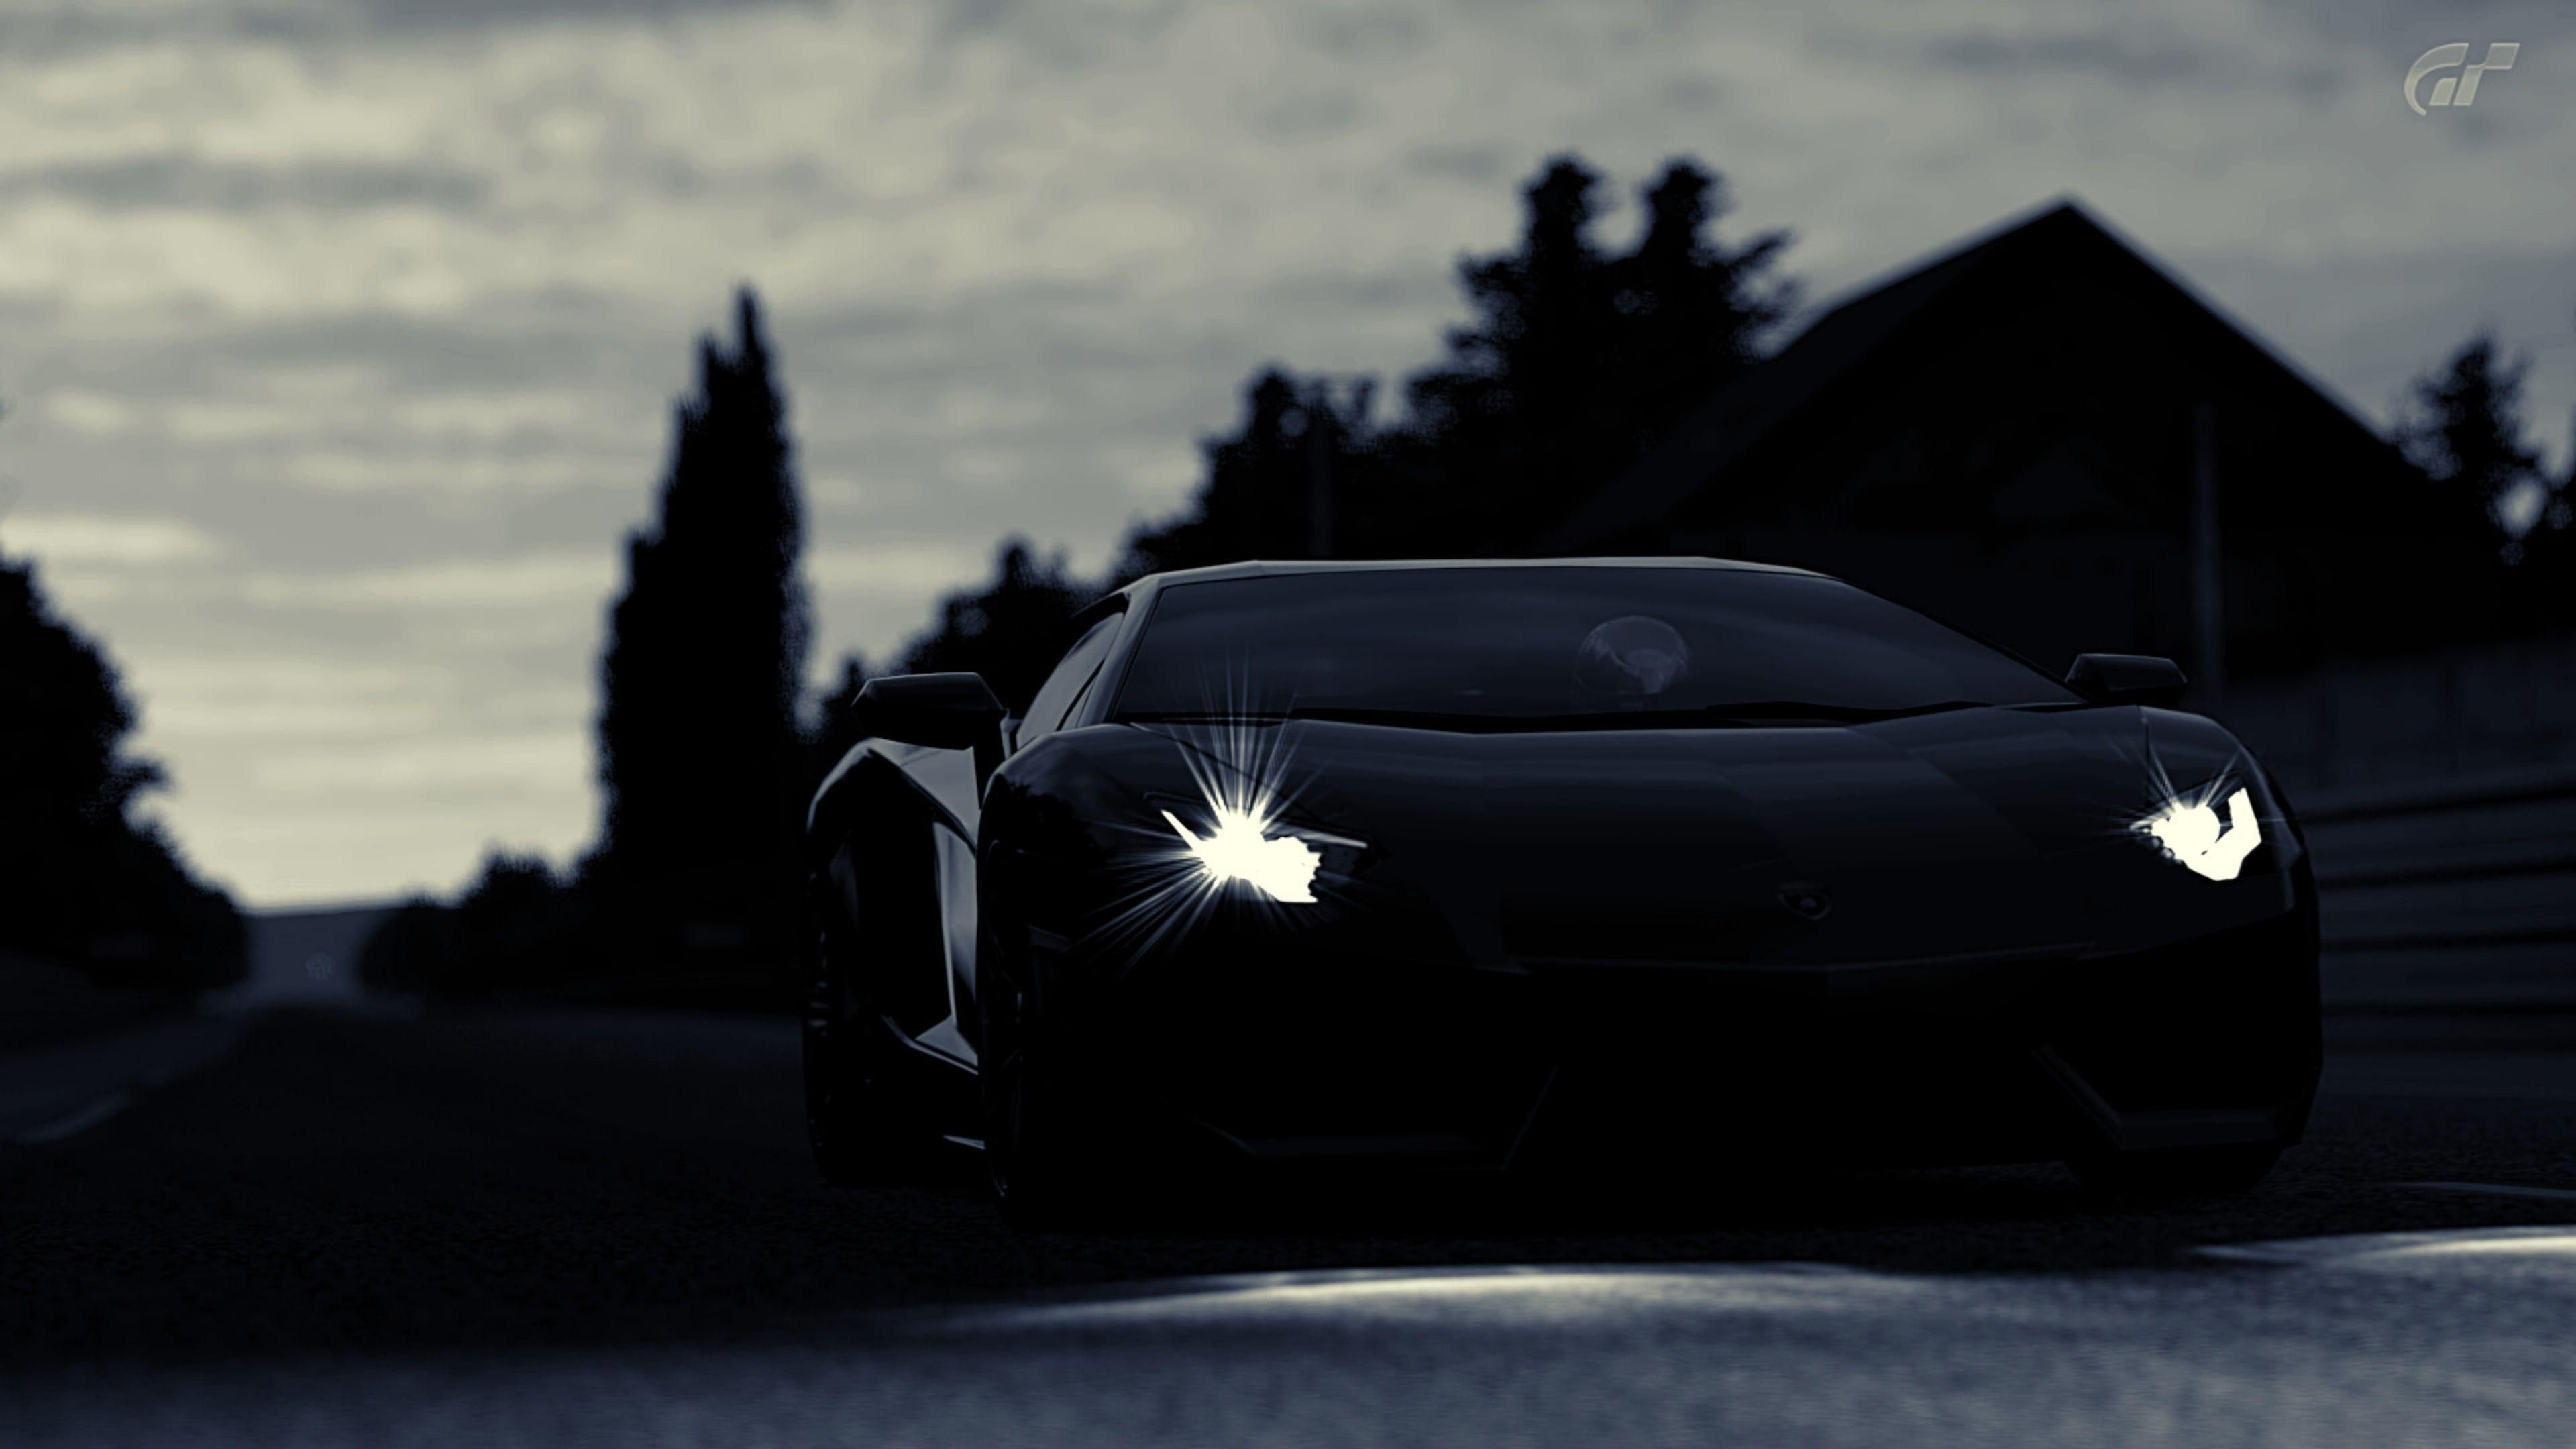 Lamborghini Dark 3840x2160 Full Credits To U Williamc520 Hd Dark Wallpapers Download Wallpaper Hd Dark Wallpapers Desktop dark wallpaper hd for pc